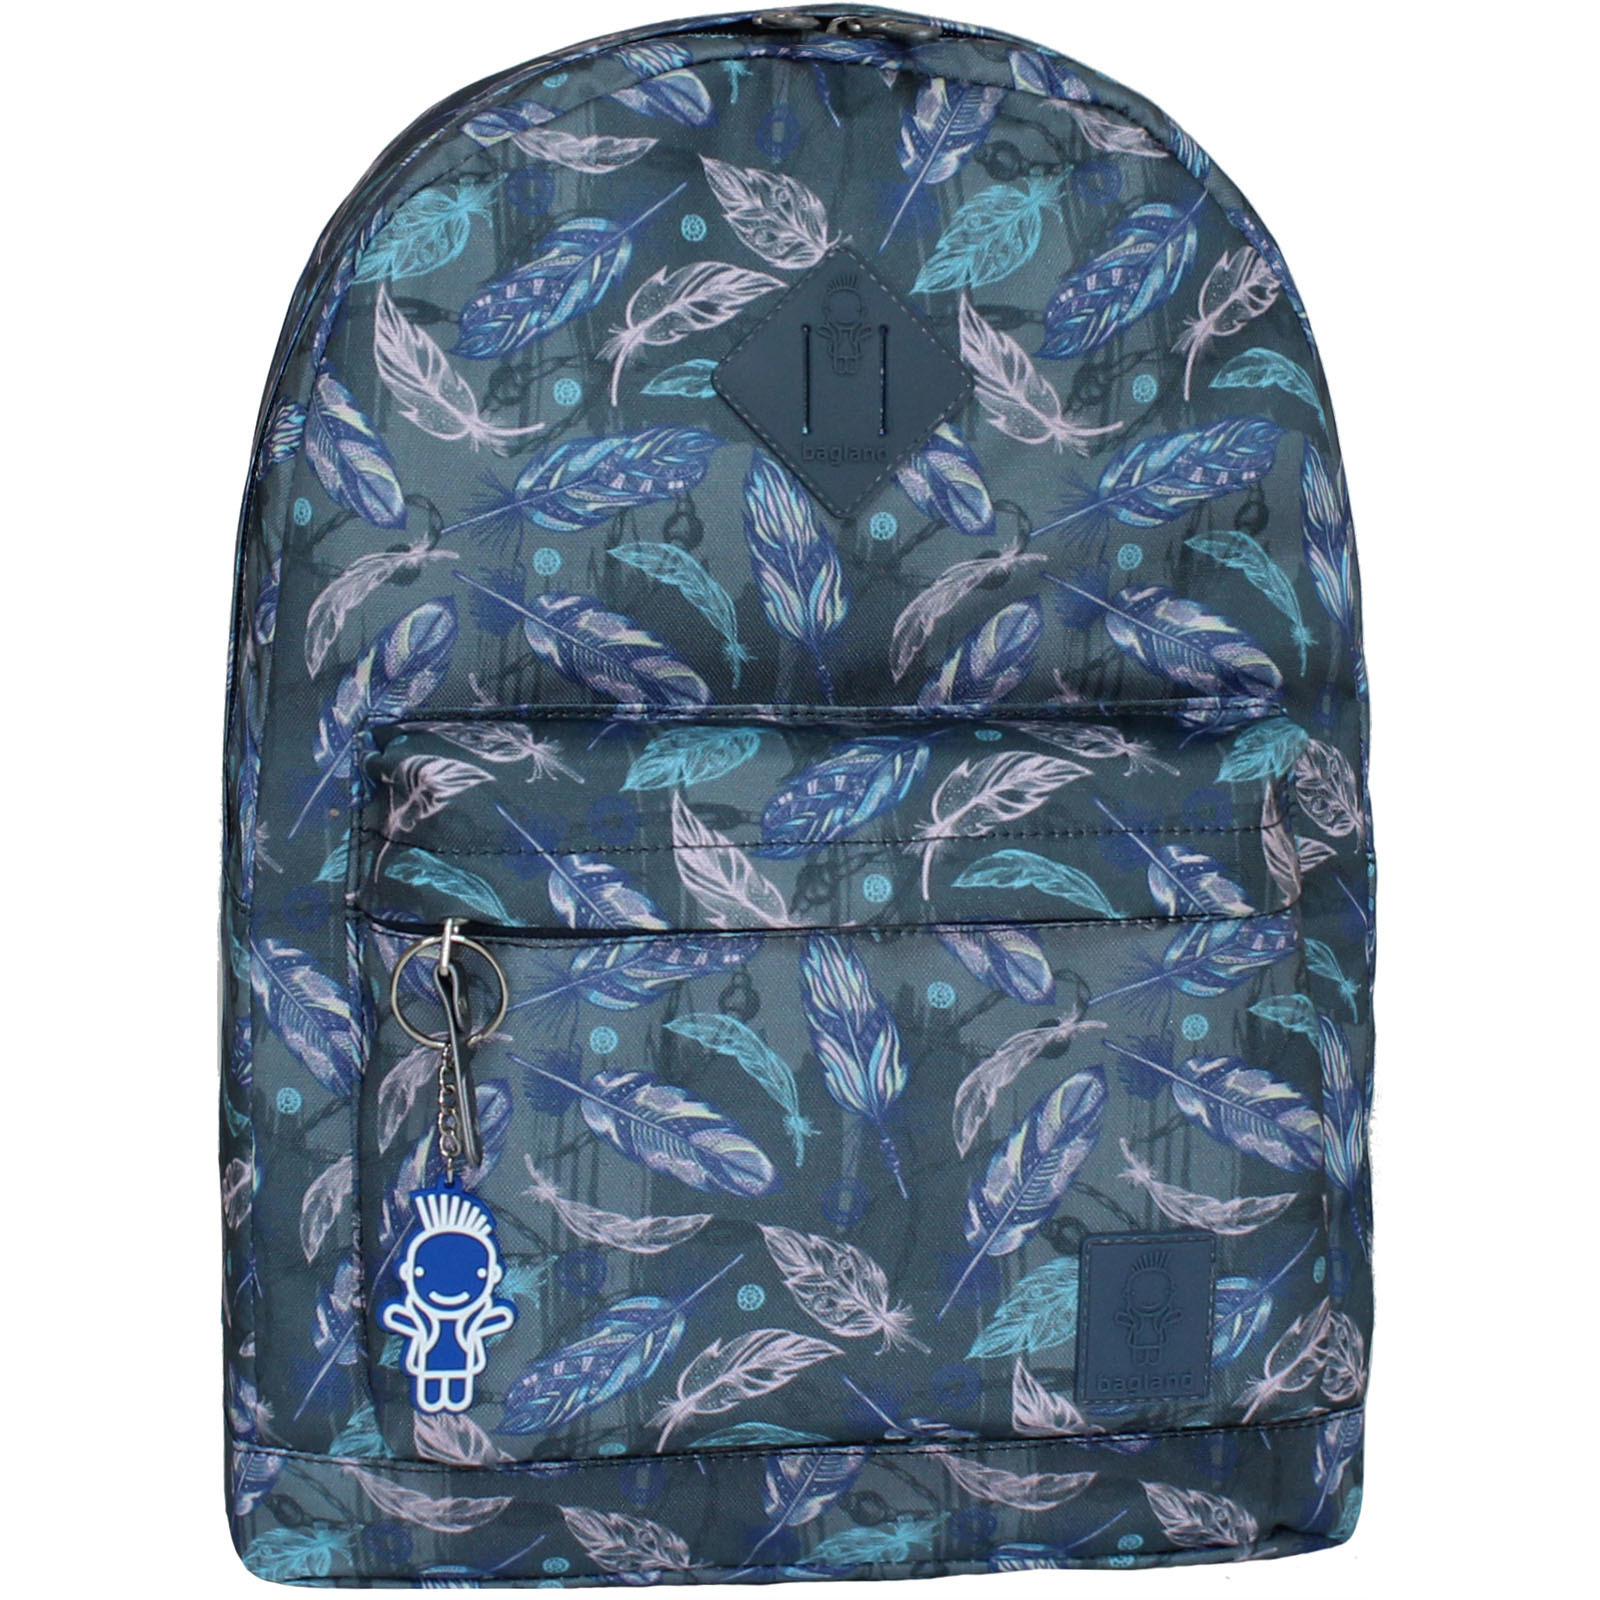 Городские рюкзаки Рюкзак Bagland Молодежный (дизайн) 17 л. сублимация 255 (00533664) IMG_7107_255.JPG